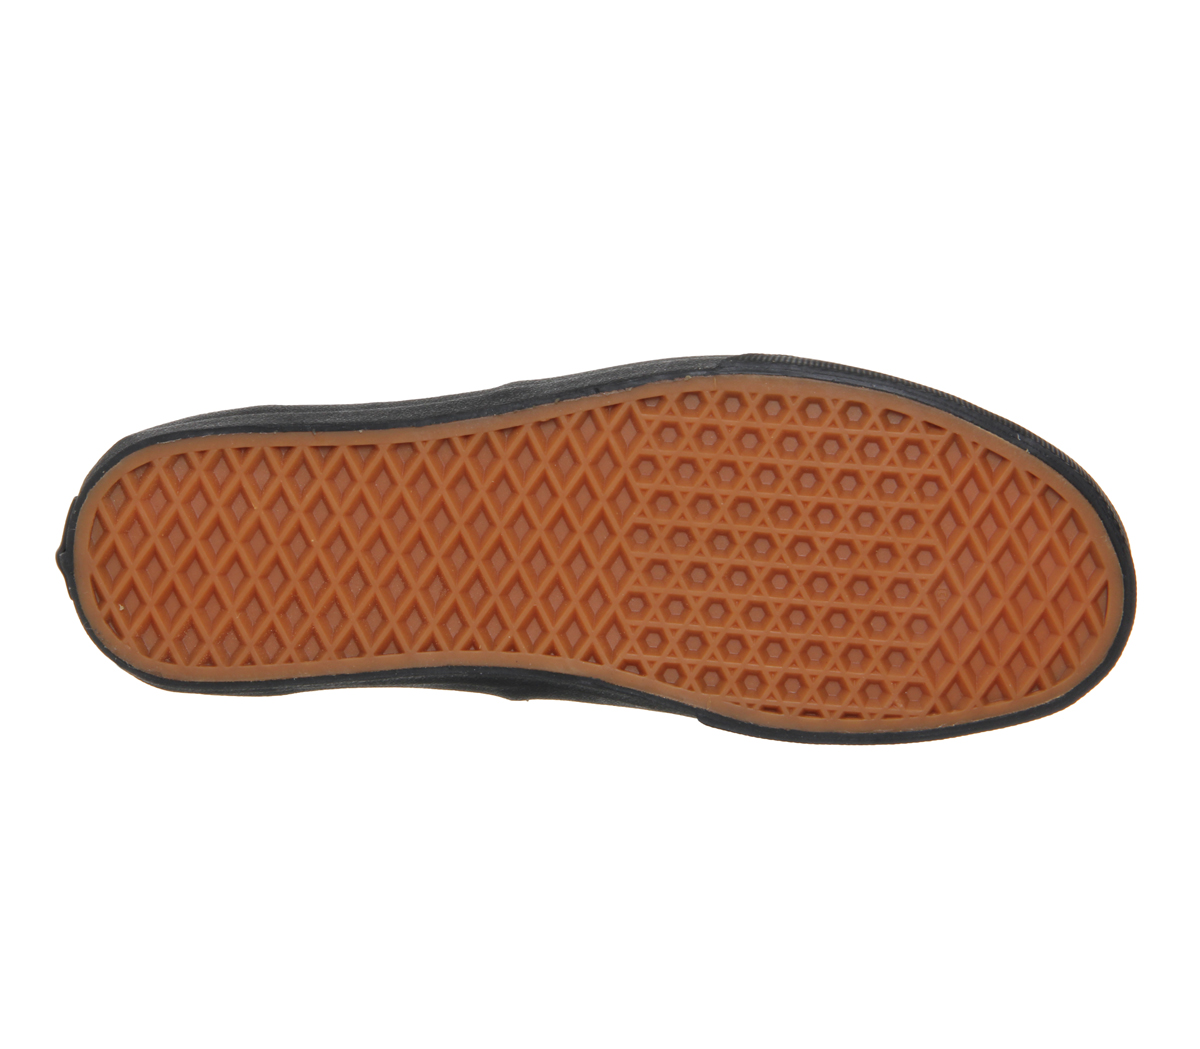 Kangaroos Ultimate retro zapatos Corredor Hombretecato Blanco/Rojo cortos 471100671 Blanco/Rojo Hombretecato d3f77a